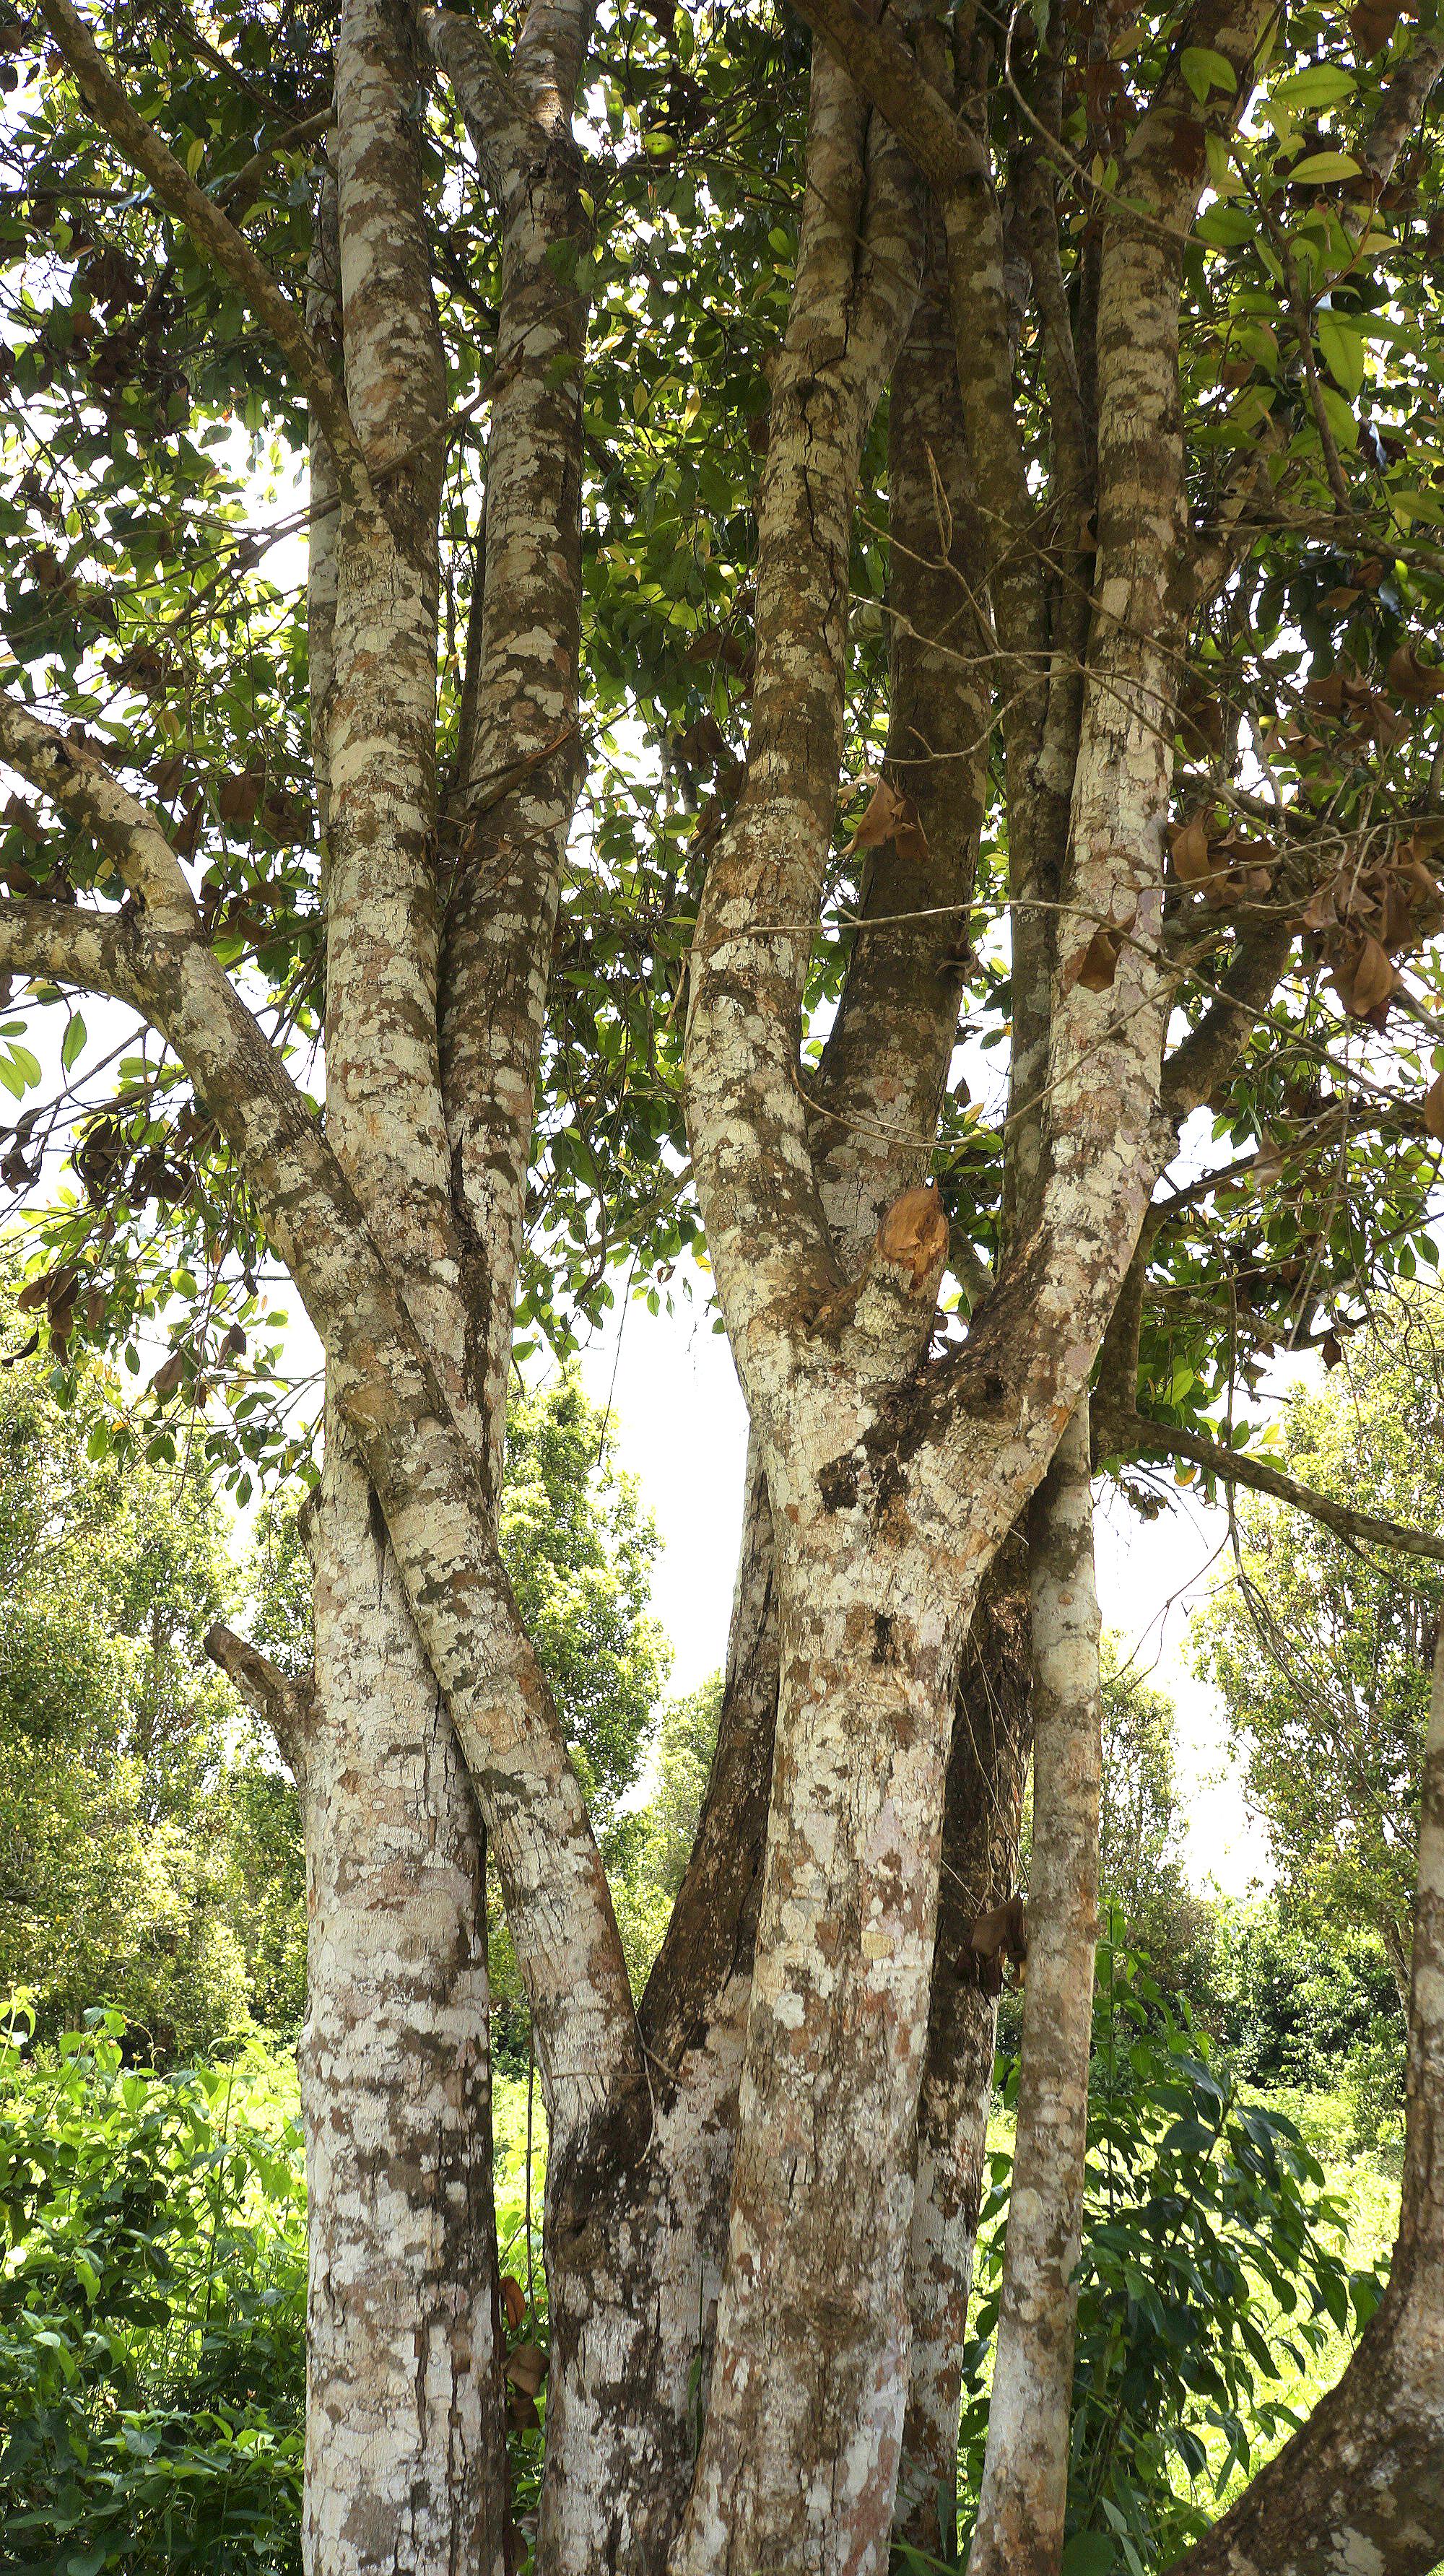 Soapnut tree during our Spice tour in Zanzibar